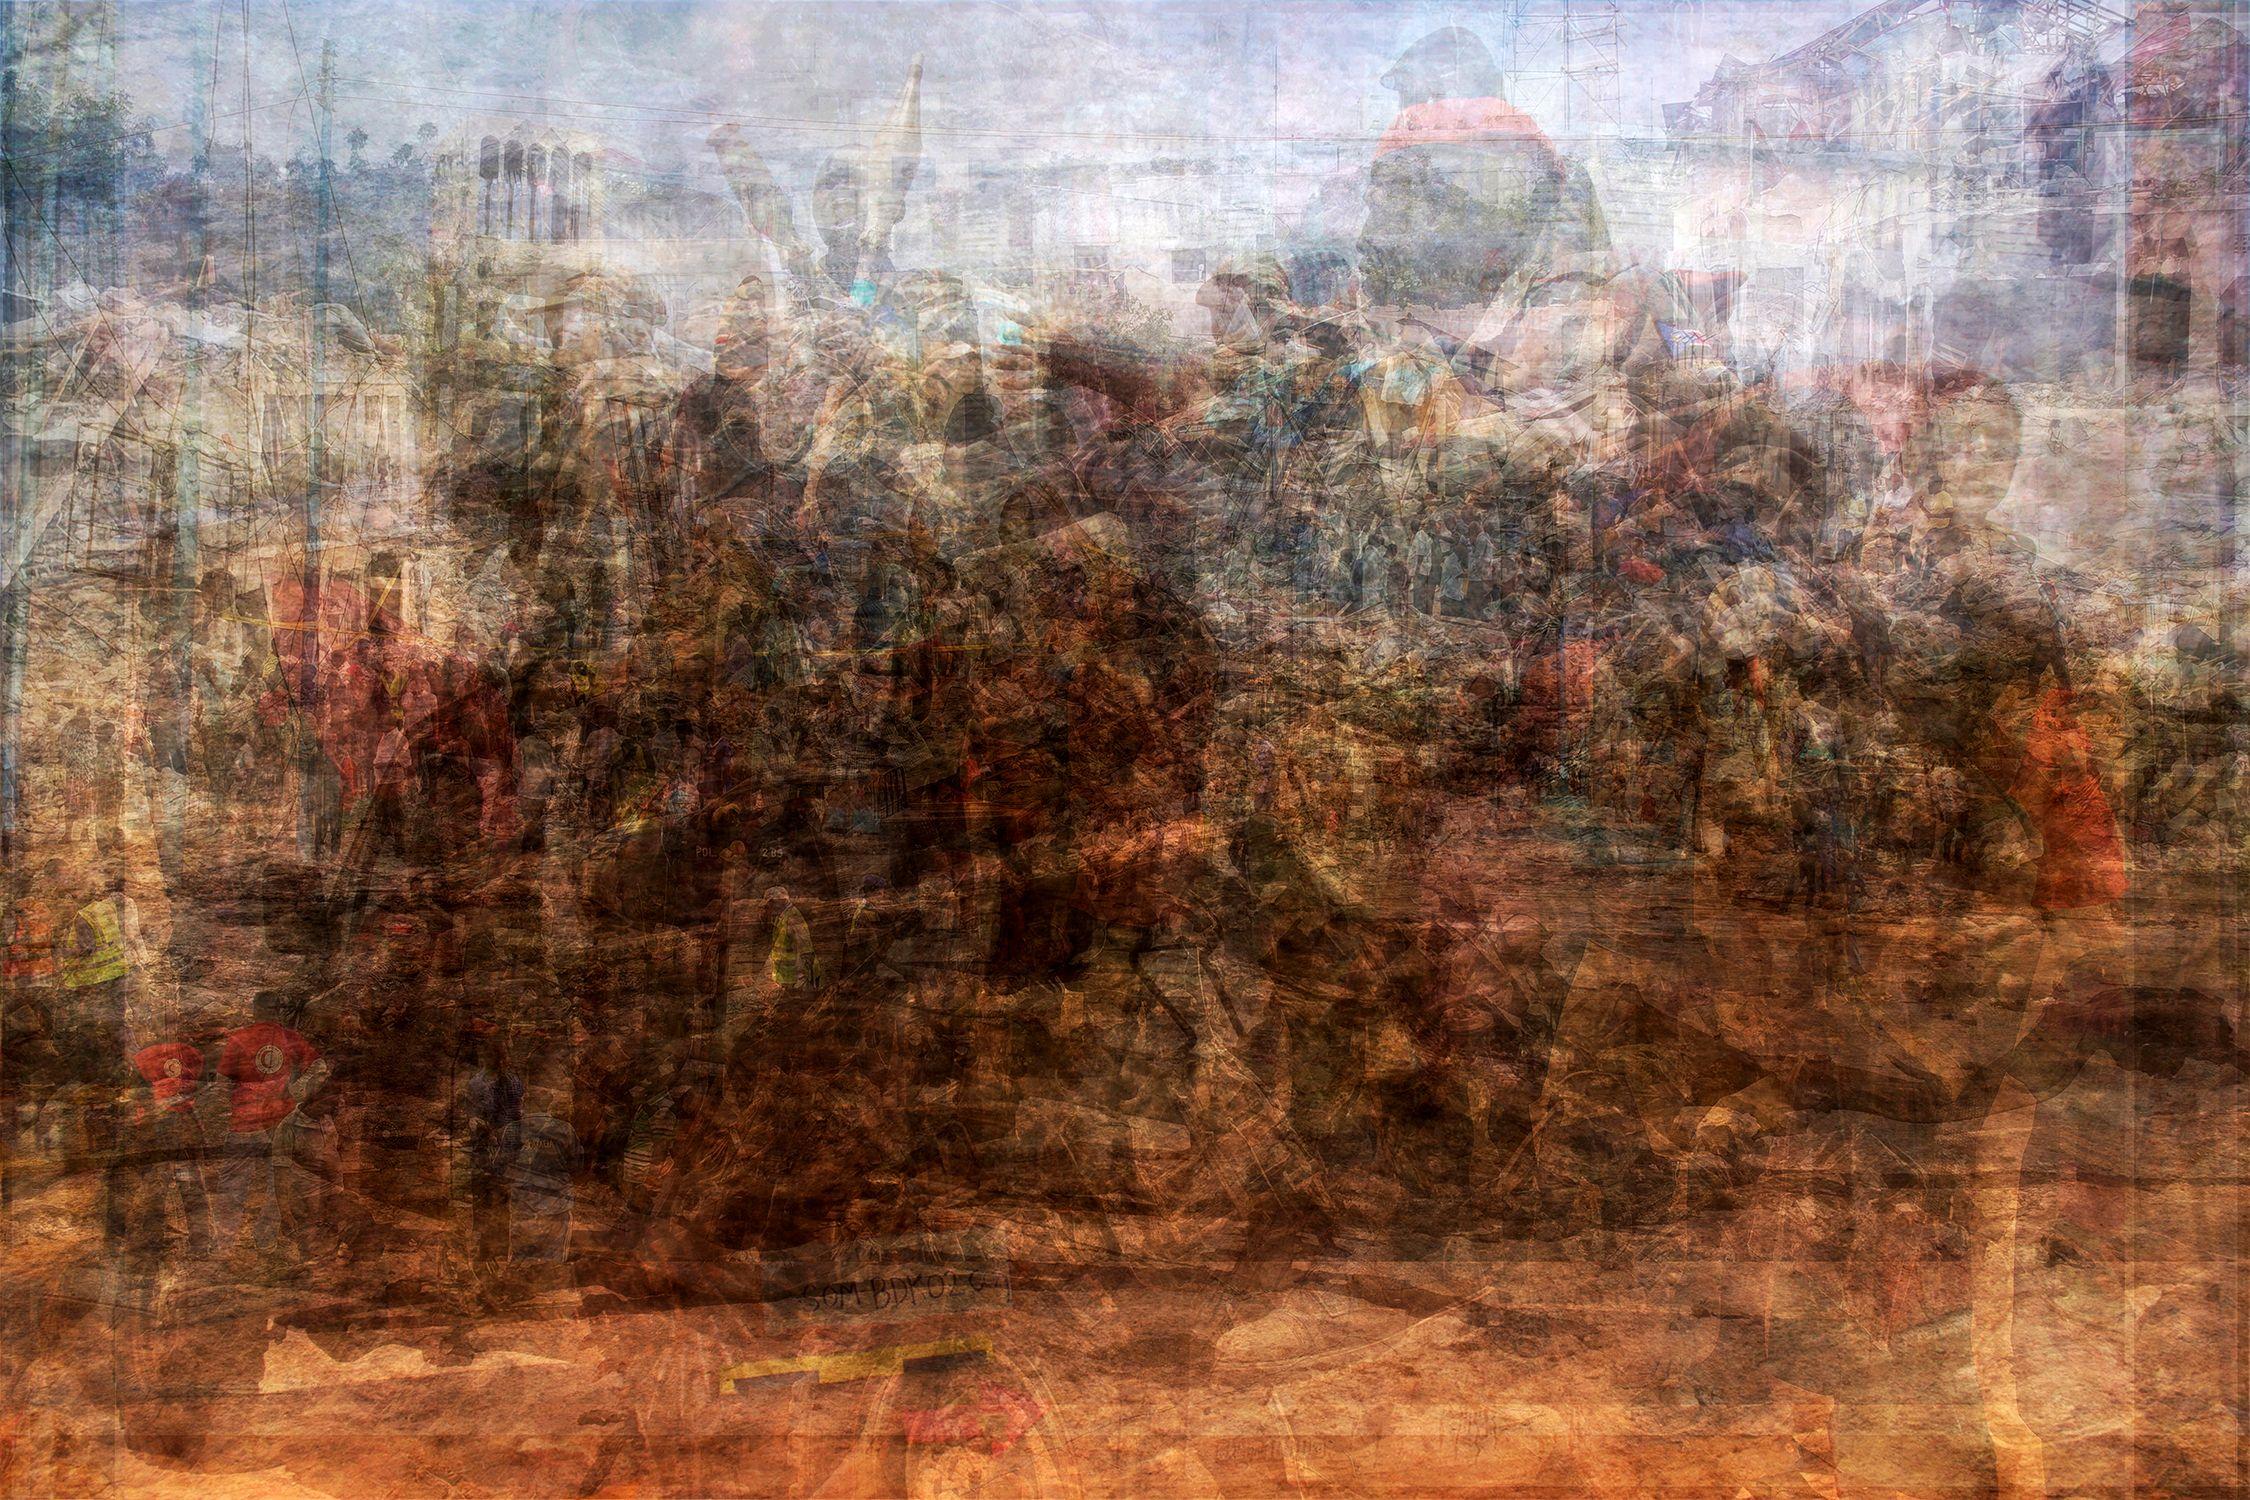 Hunderte überlagerte Bilder aus dem Bürgerkrieg in Somalia.